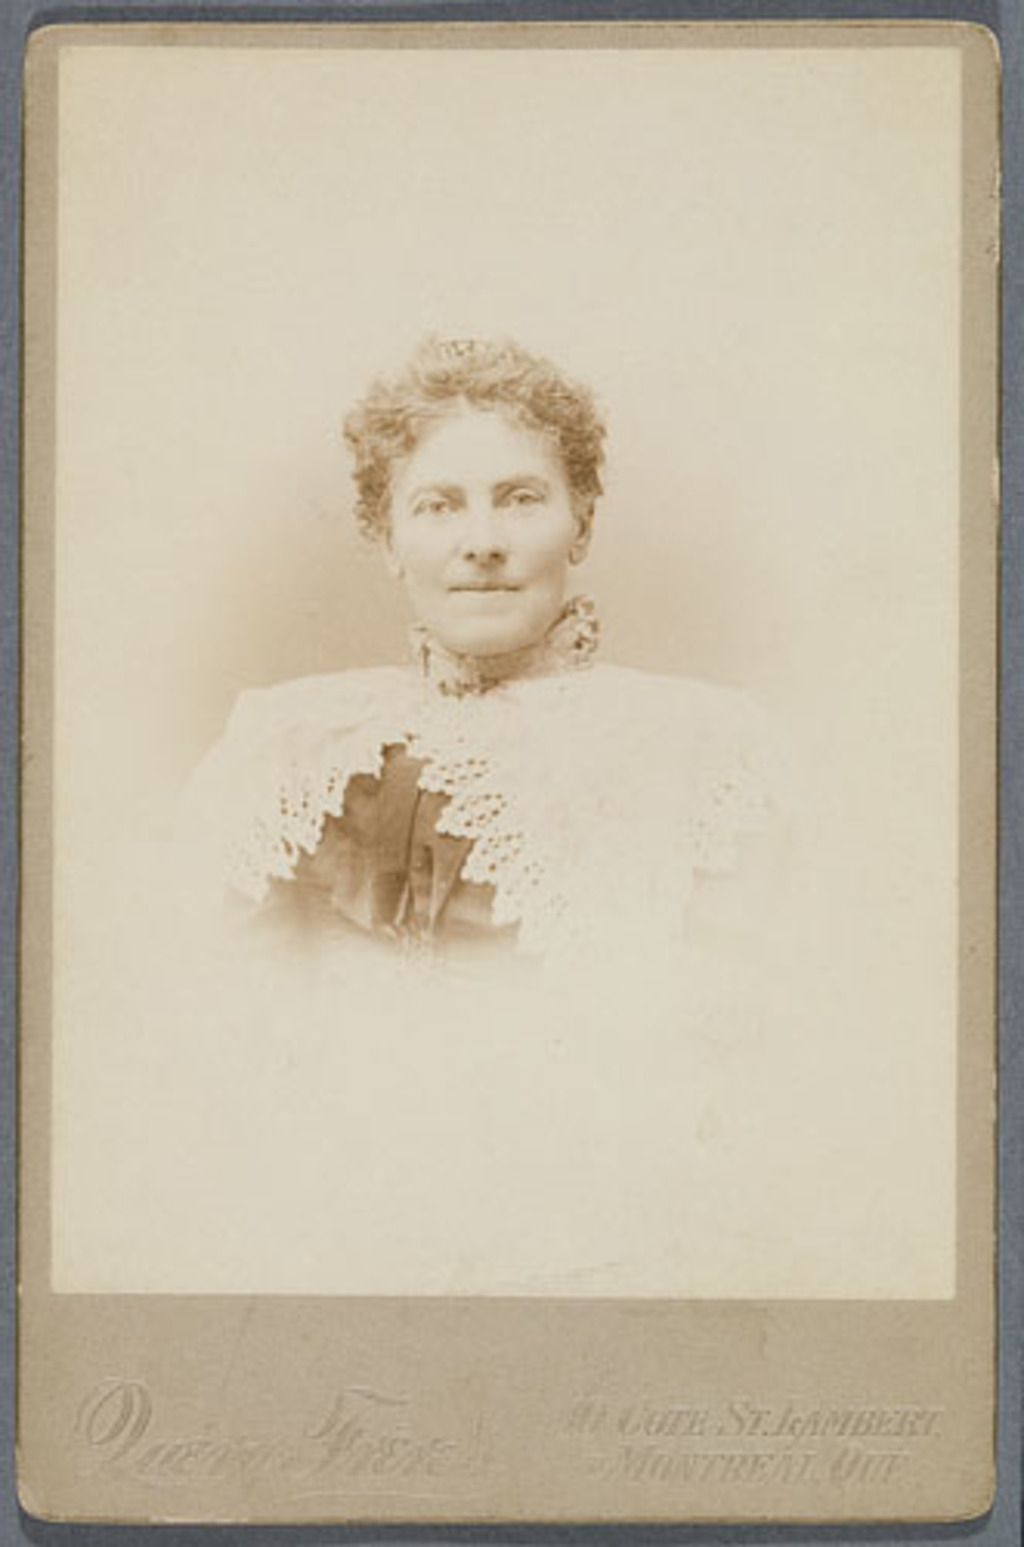 Delphine Plamondon